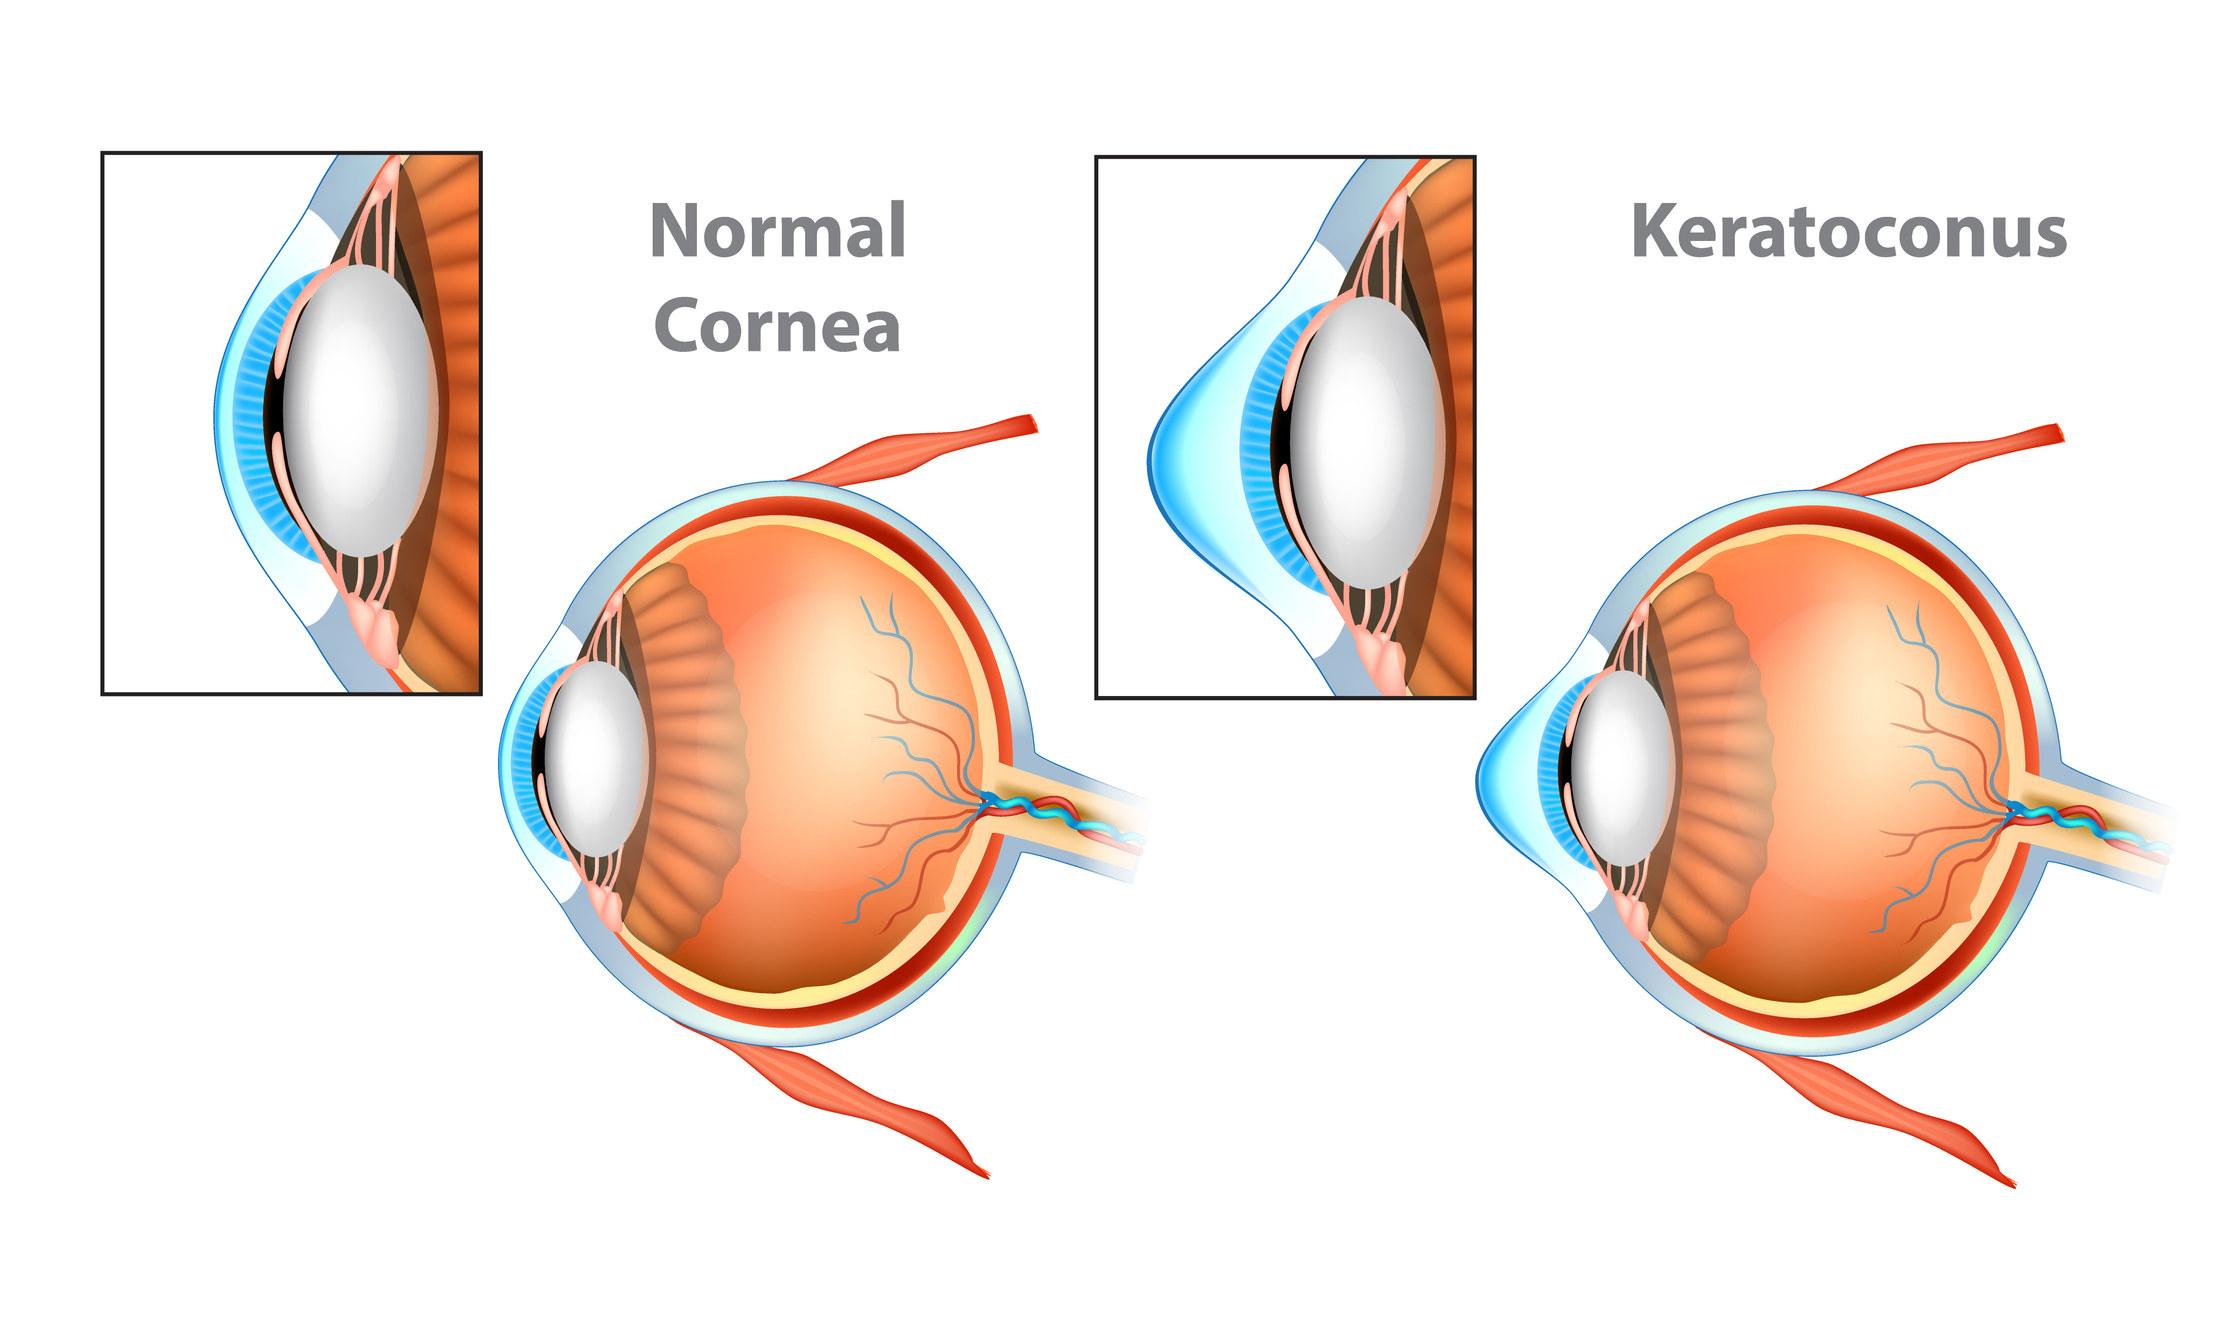 A keratoconus diagram